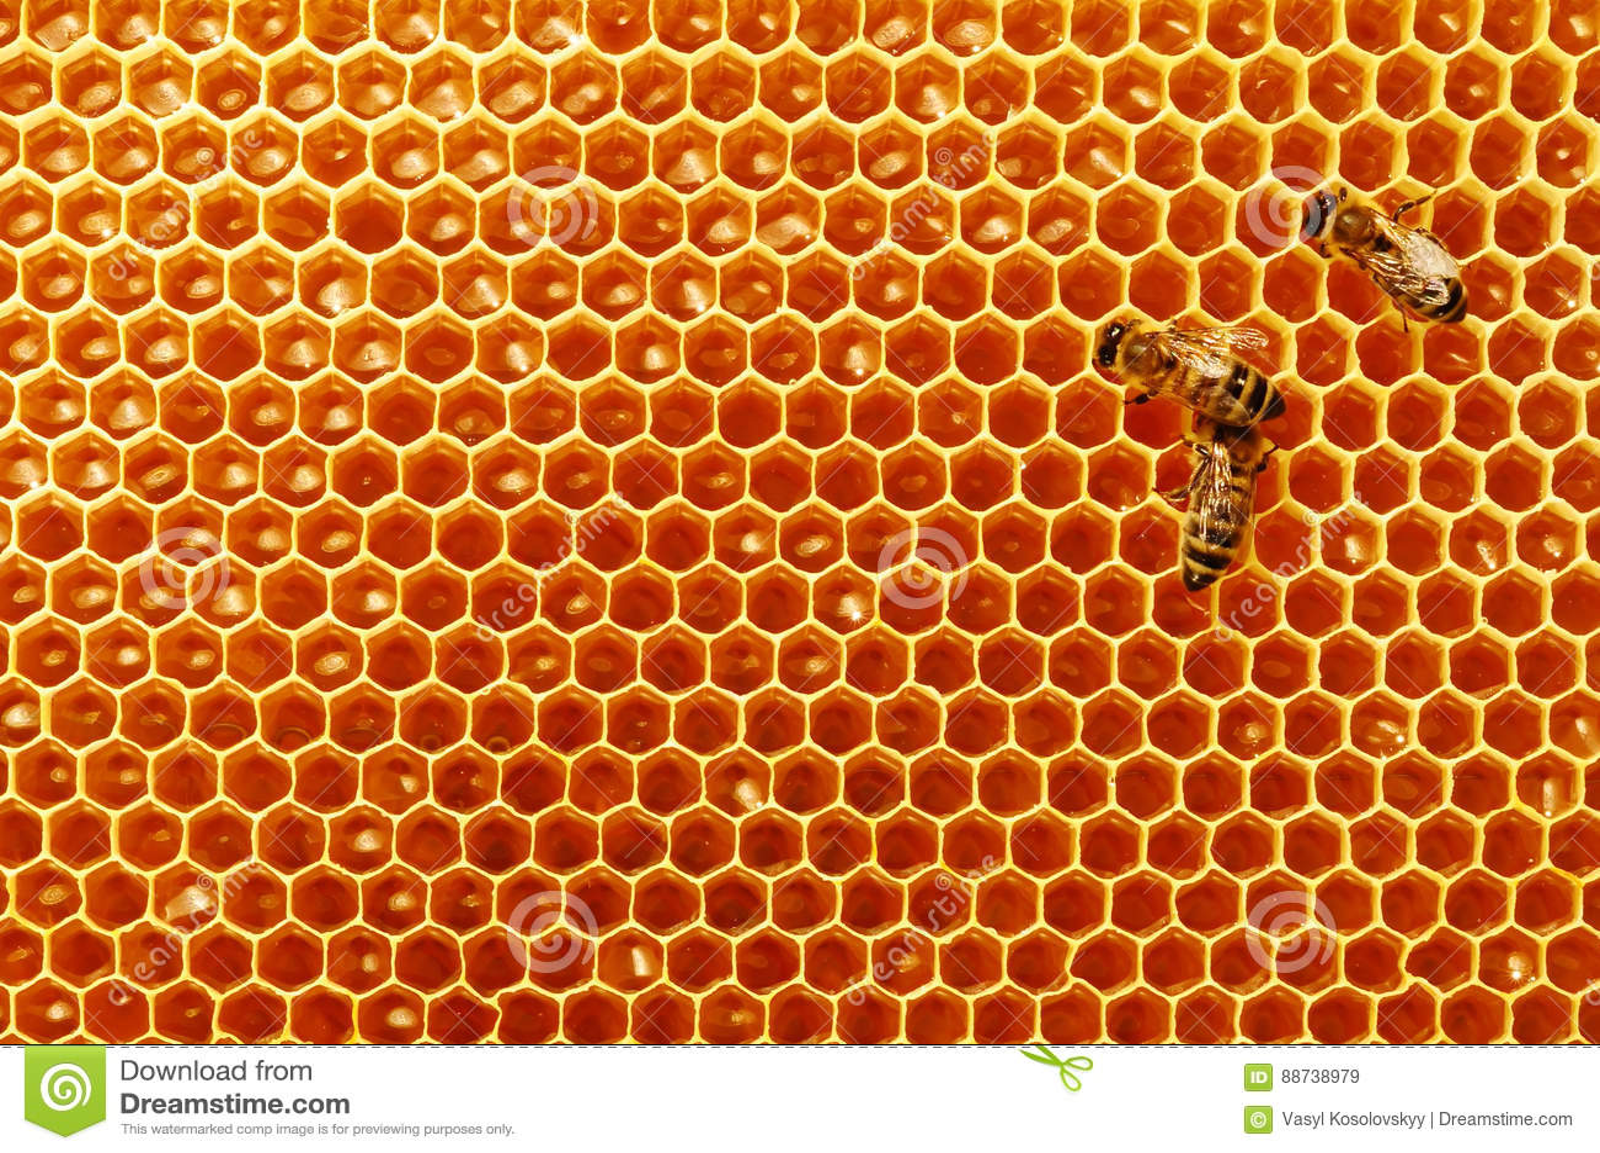 Download 蜂蜂窝用蜂蜜和蜂 养蜂 库存图片. 图片 包括有 喻被困惑困惑, 茴香, 蜂蜜, 金黄, 格言, 形状, 六角形 - 88738979